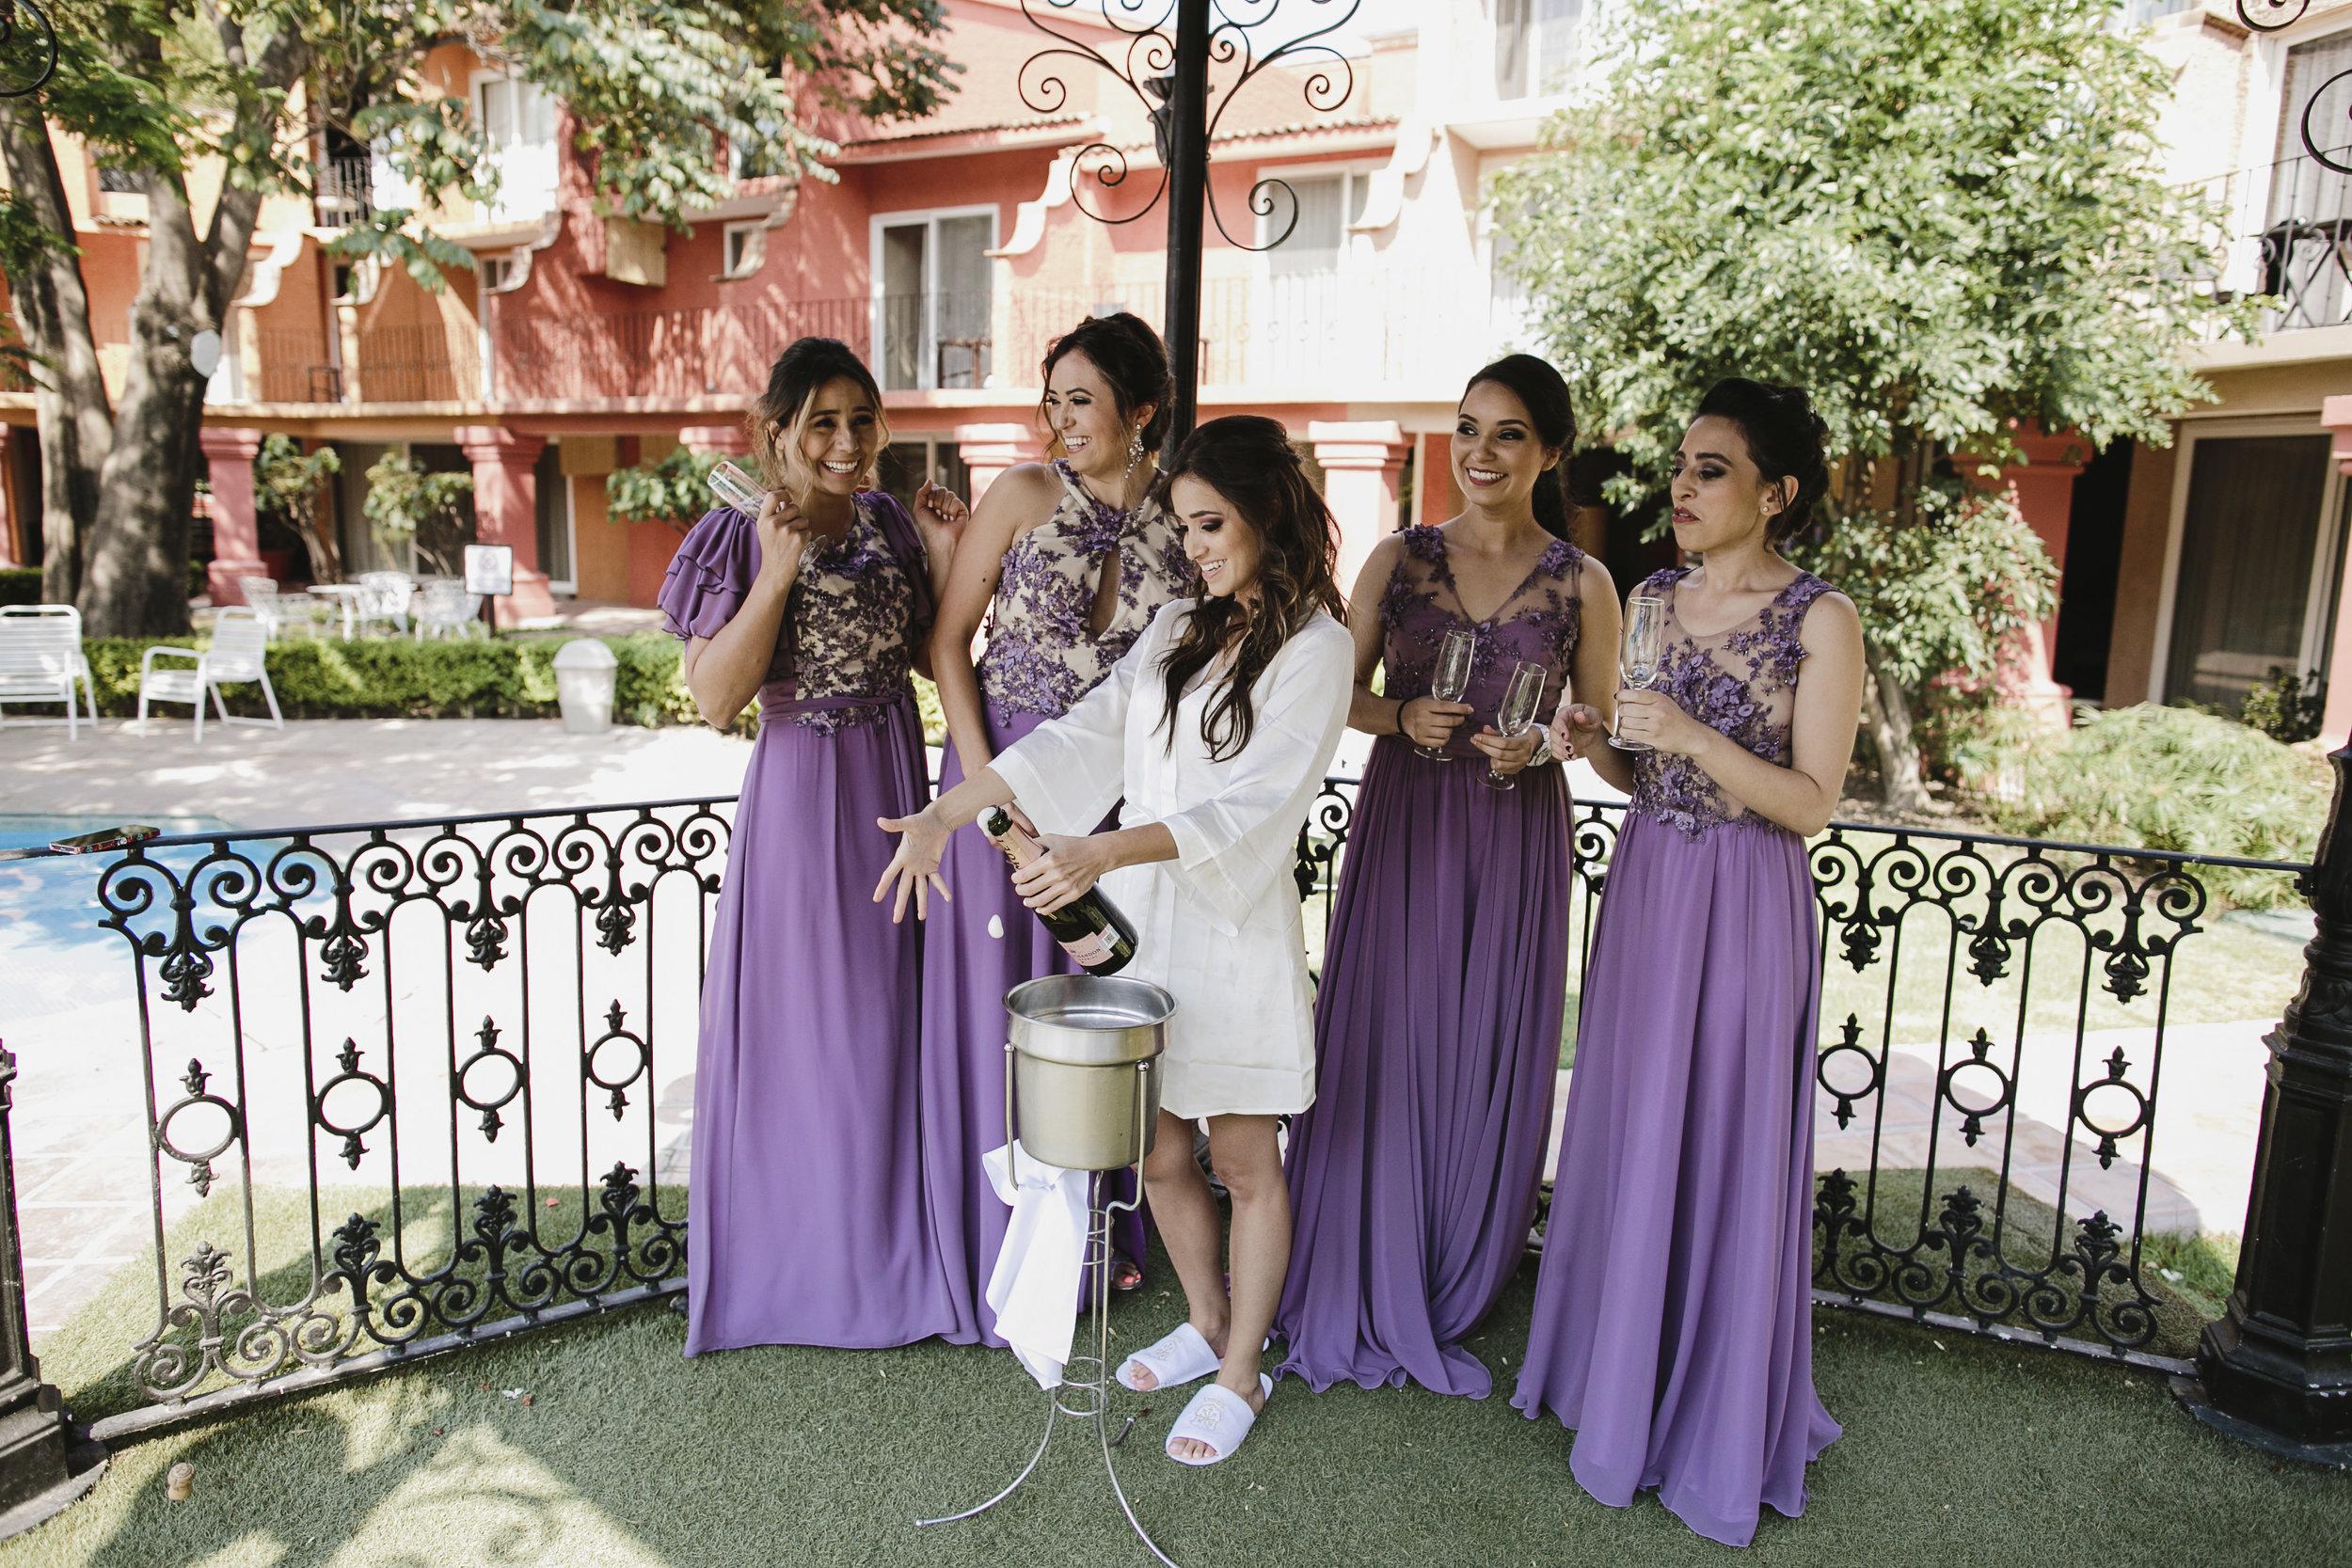 alfons_flores_destination_wedding_photography_mavi_david-572.JPG